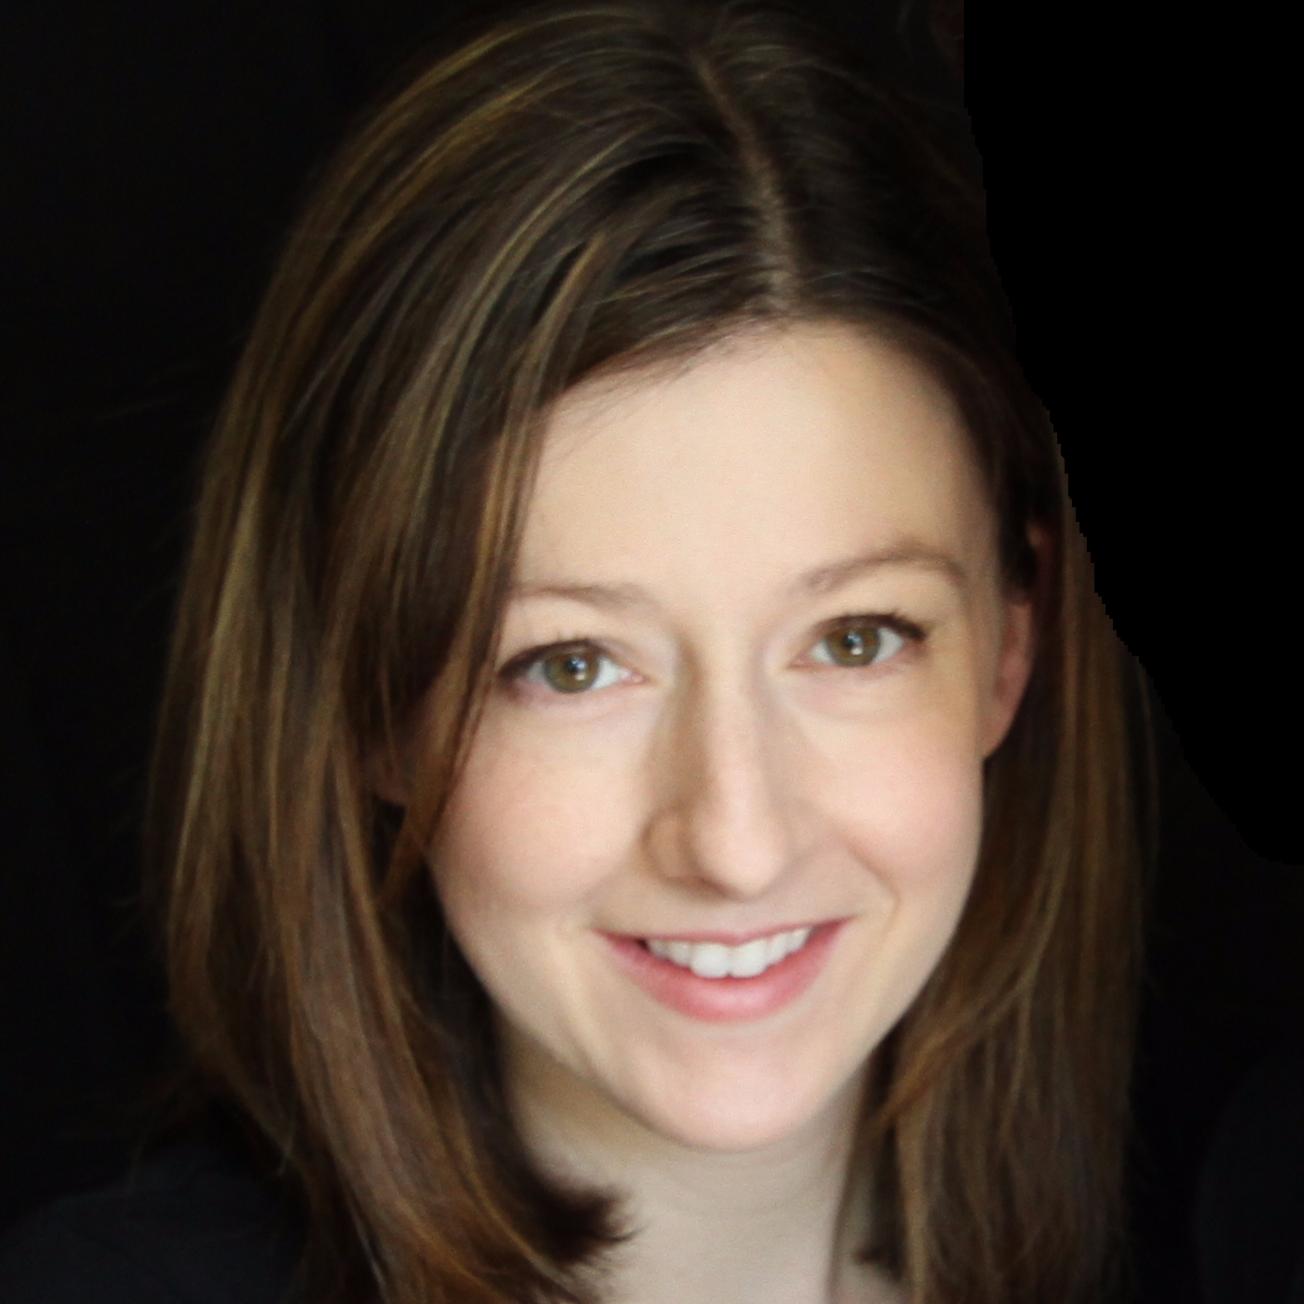 Elizabeth Arrington